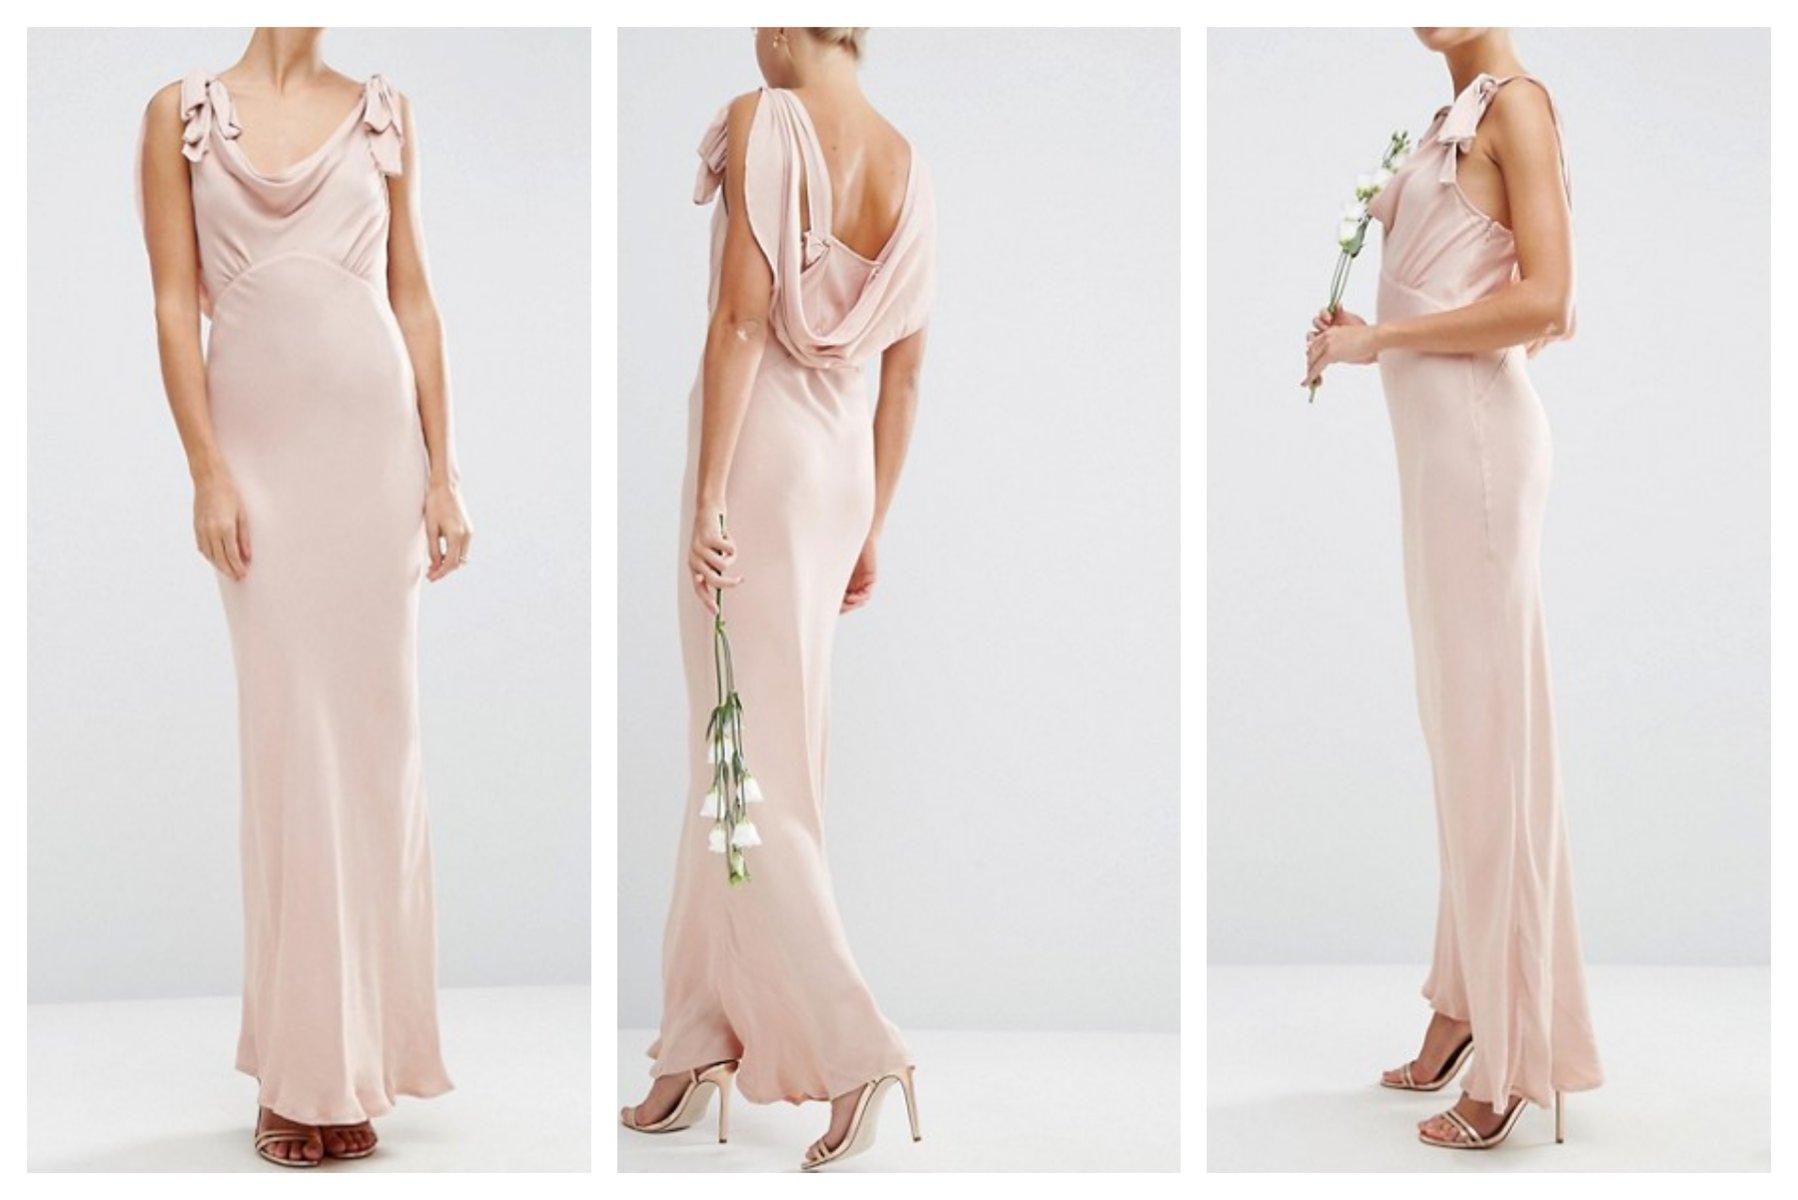 eed41a9306 mo34 sukienka satynowa różowa wesele maxi 36 - 7035091394 ...